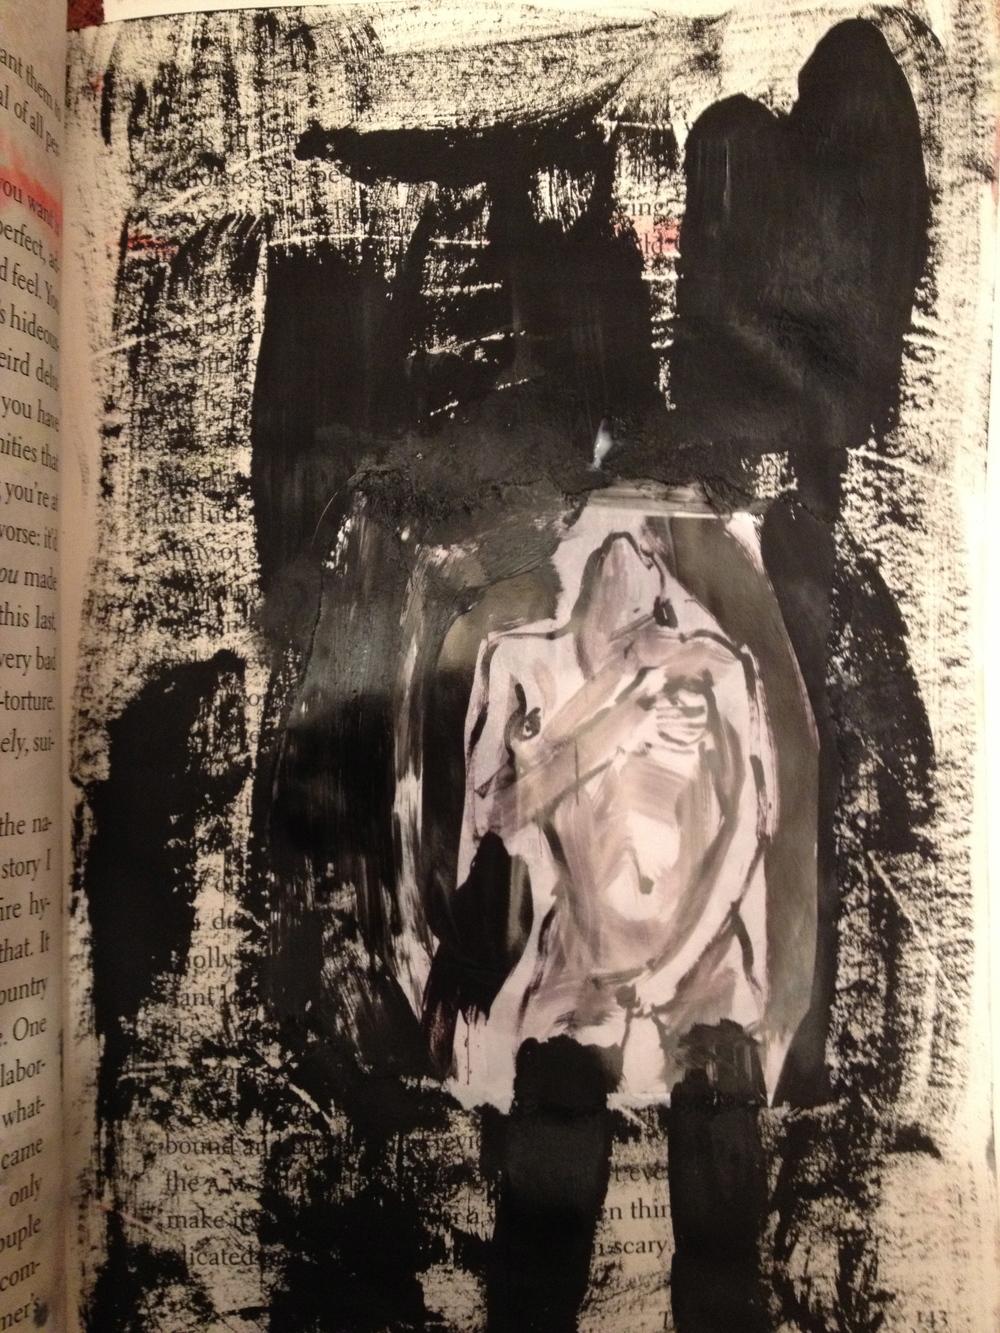 Collage/Acrylic, by Marsha Recknagel